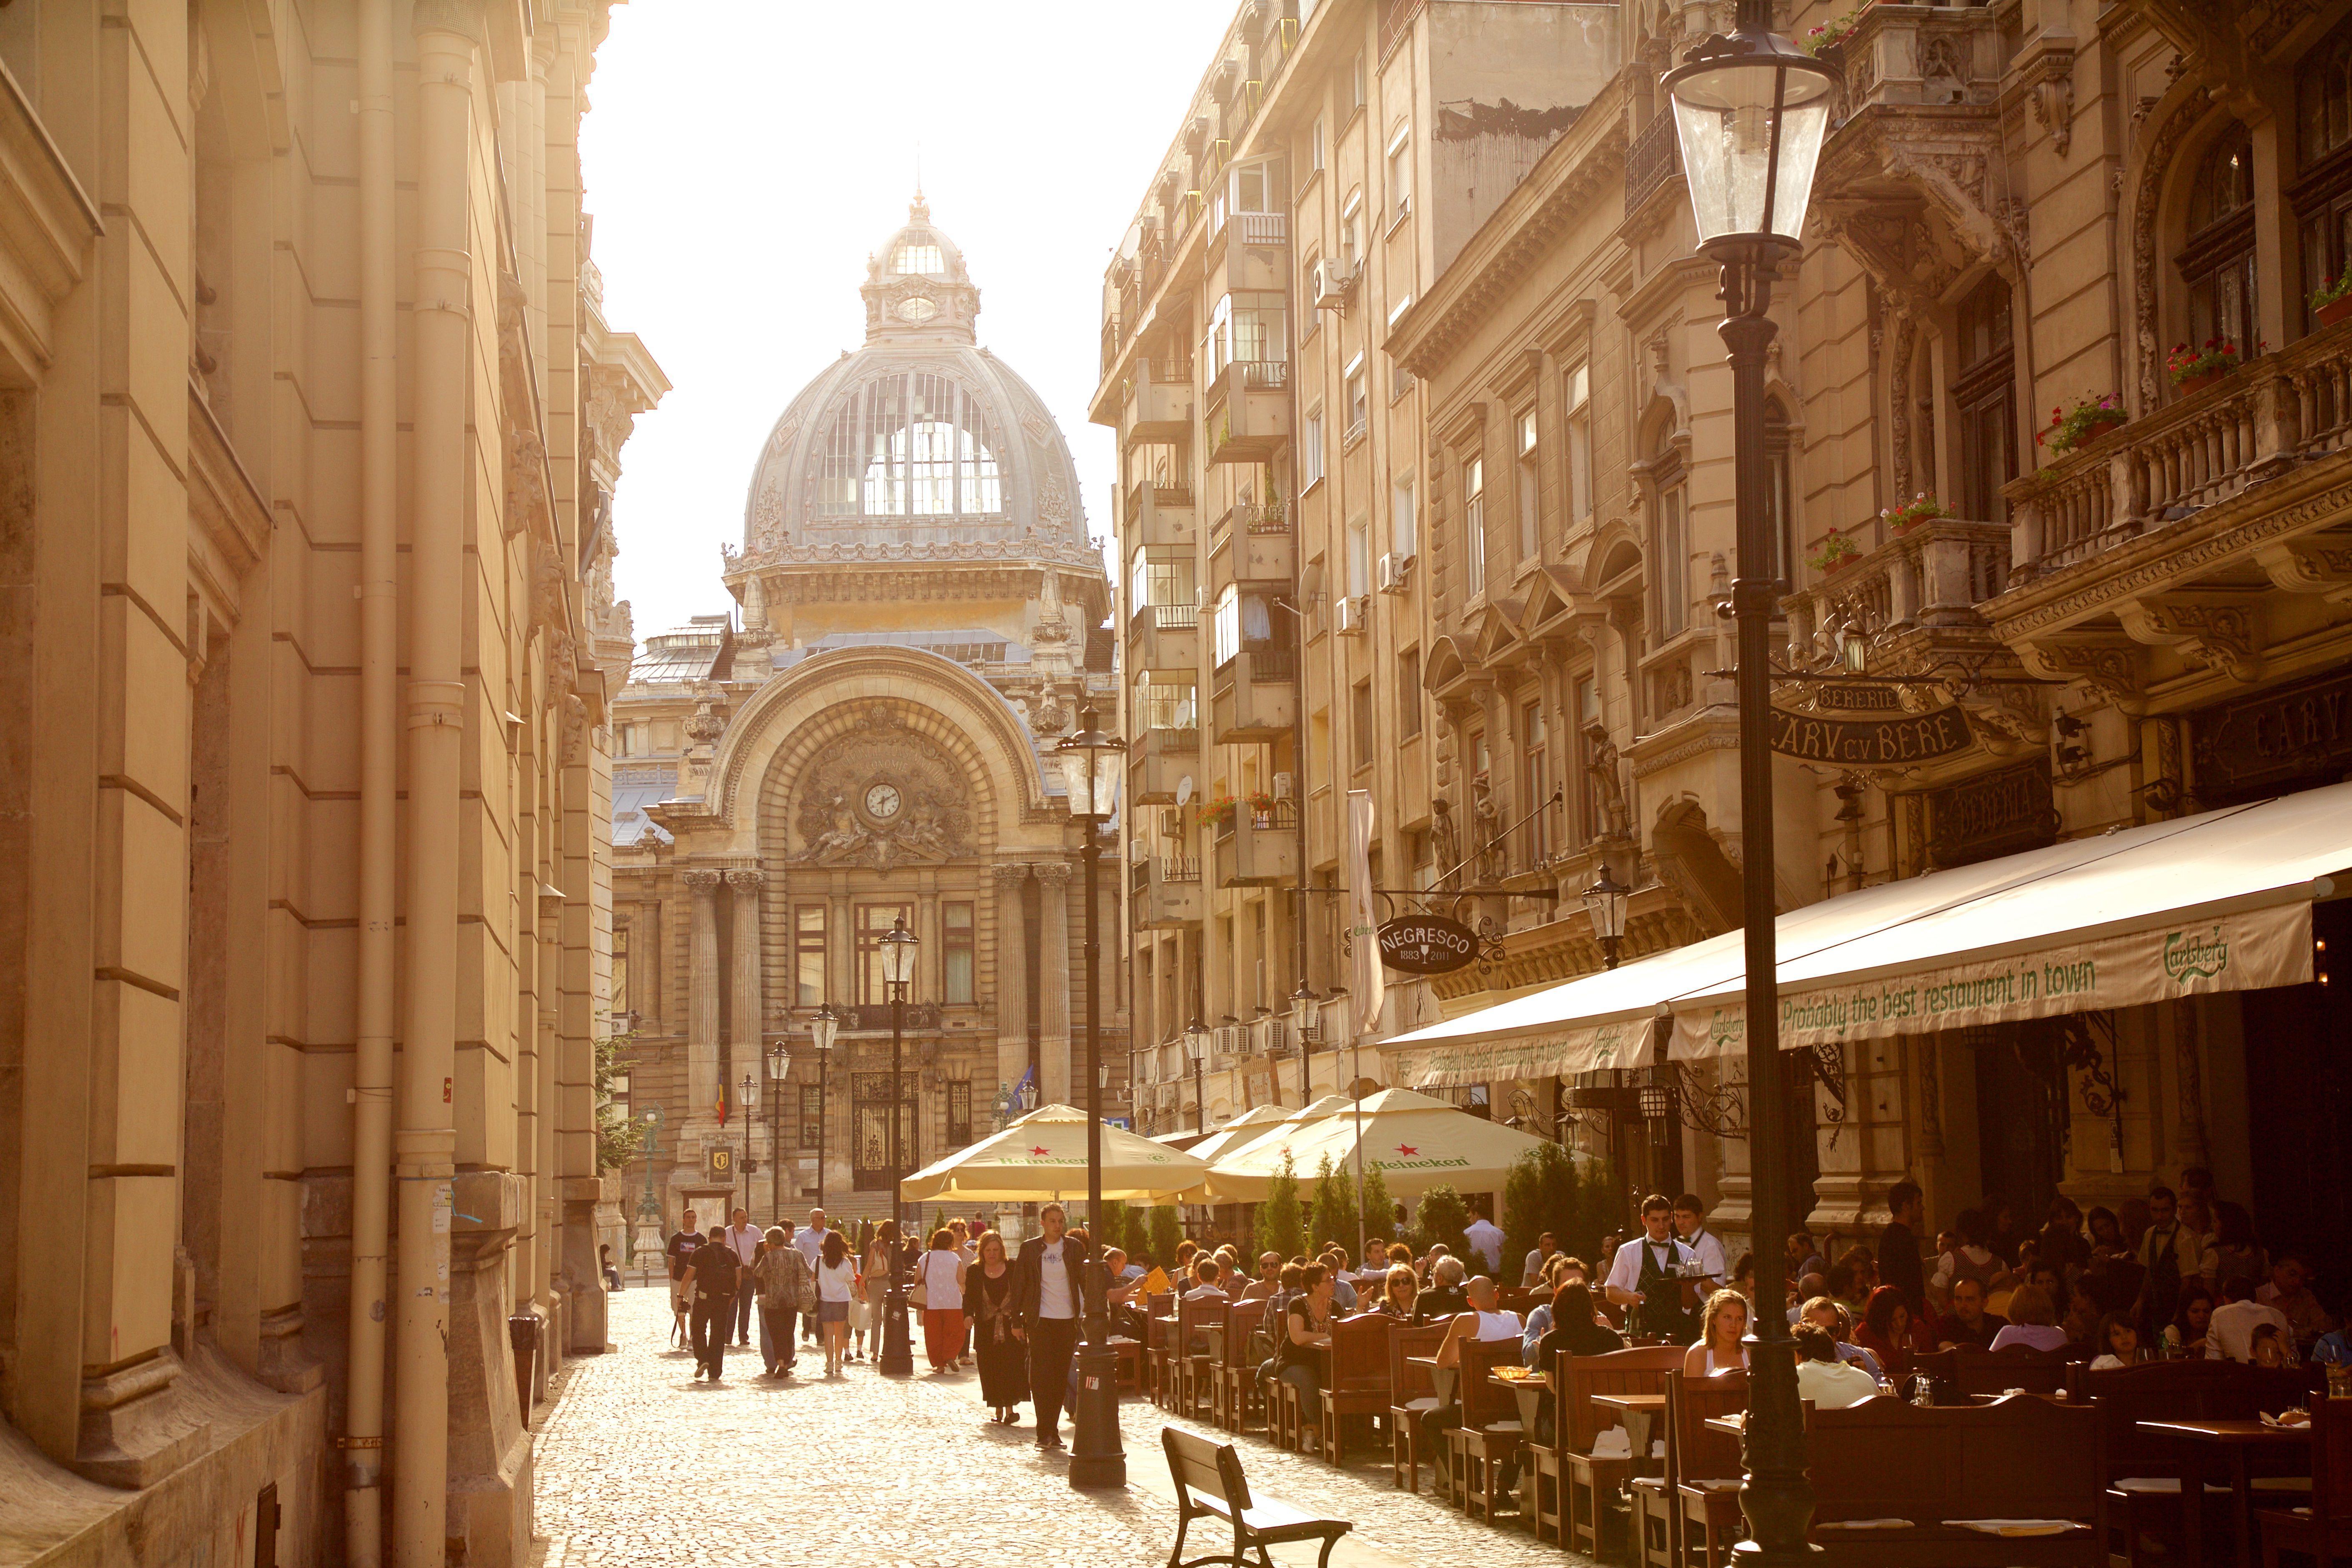 Ciudad vieja de Bucarest, Rumania